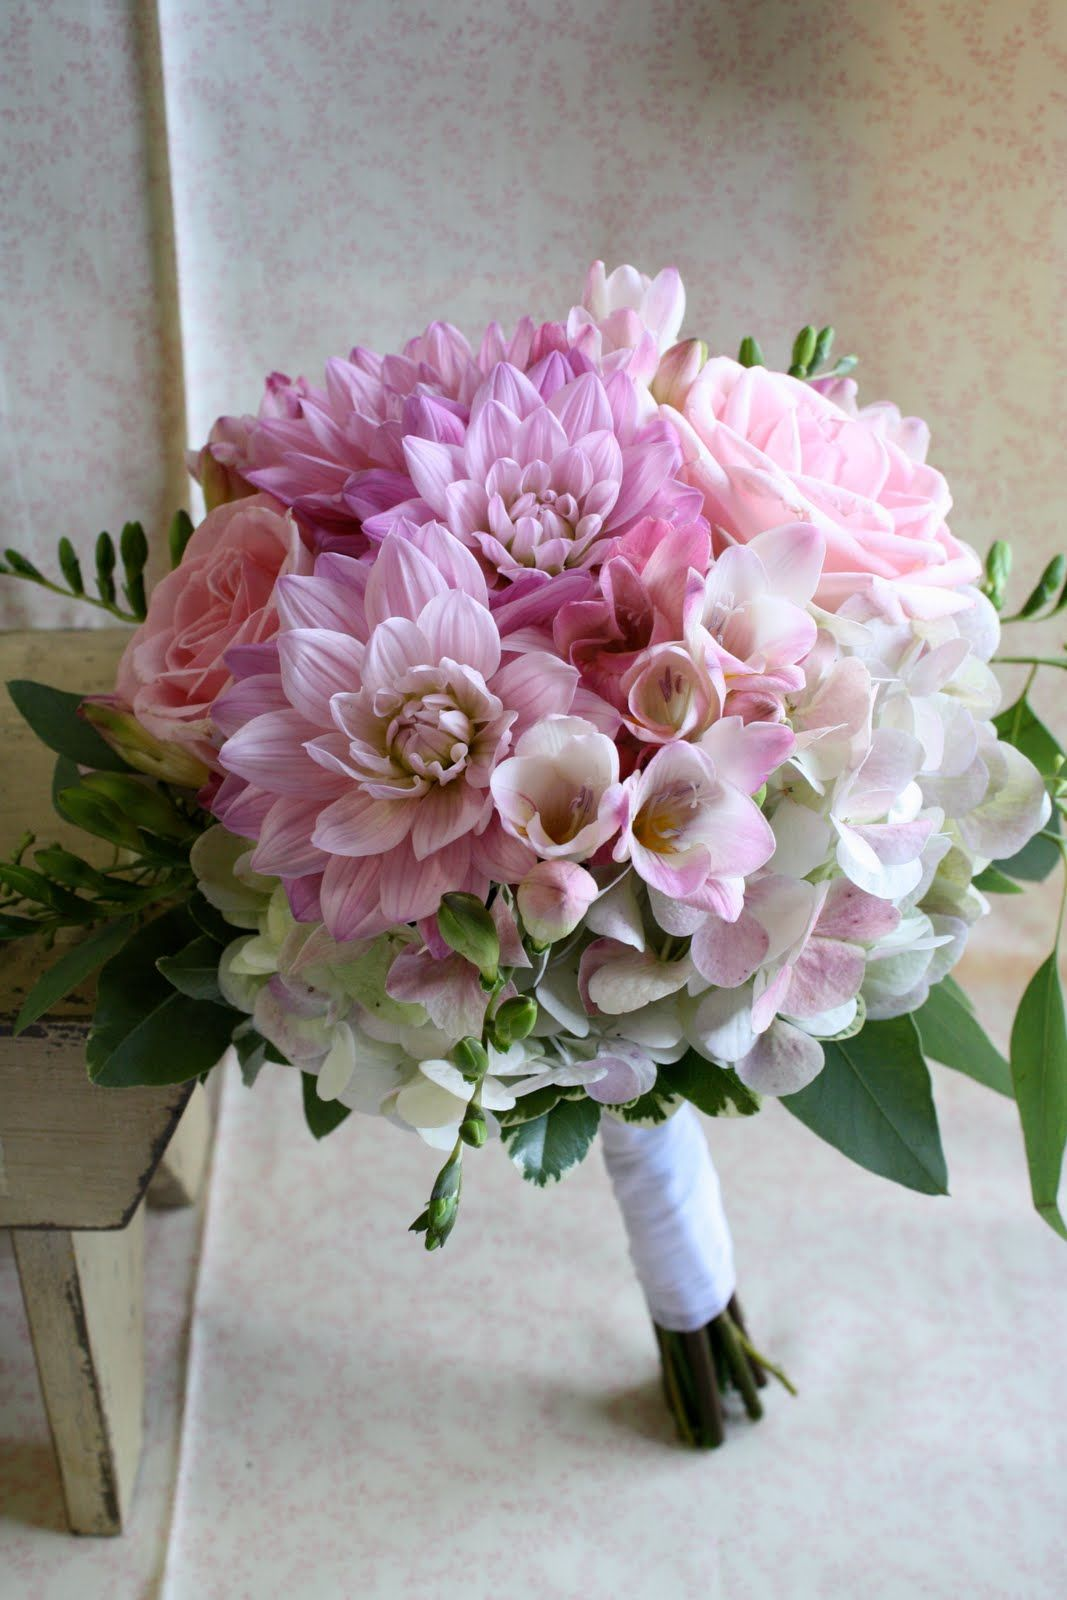 soft pink dahila, freesia, garden roses